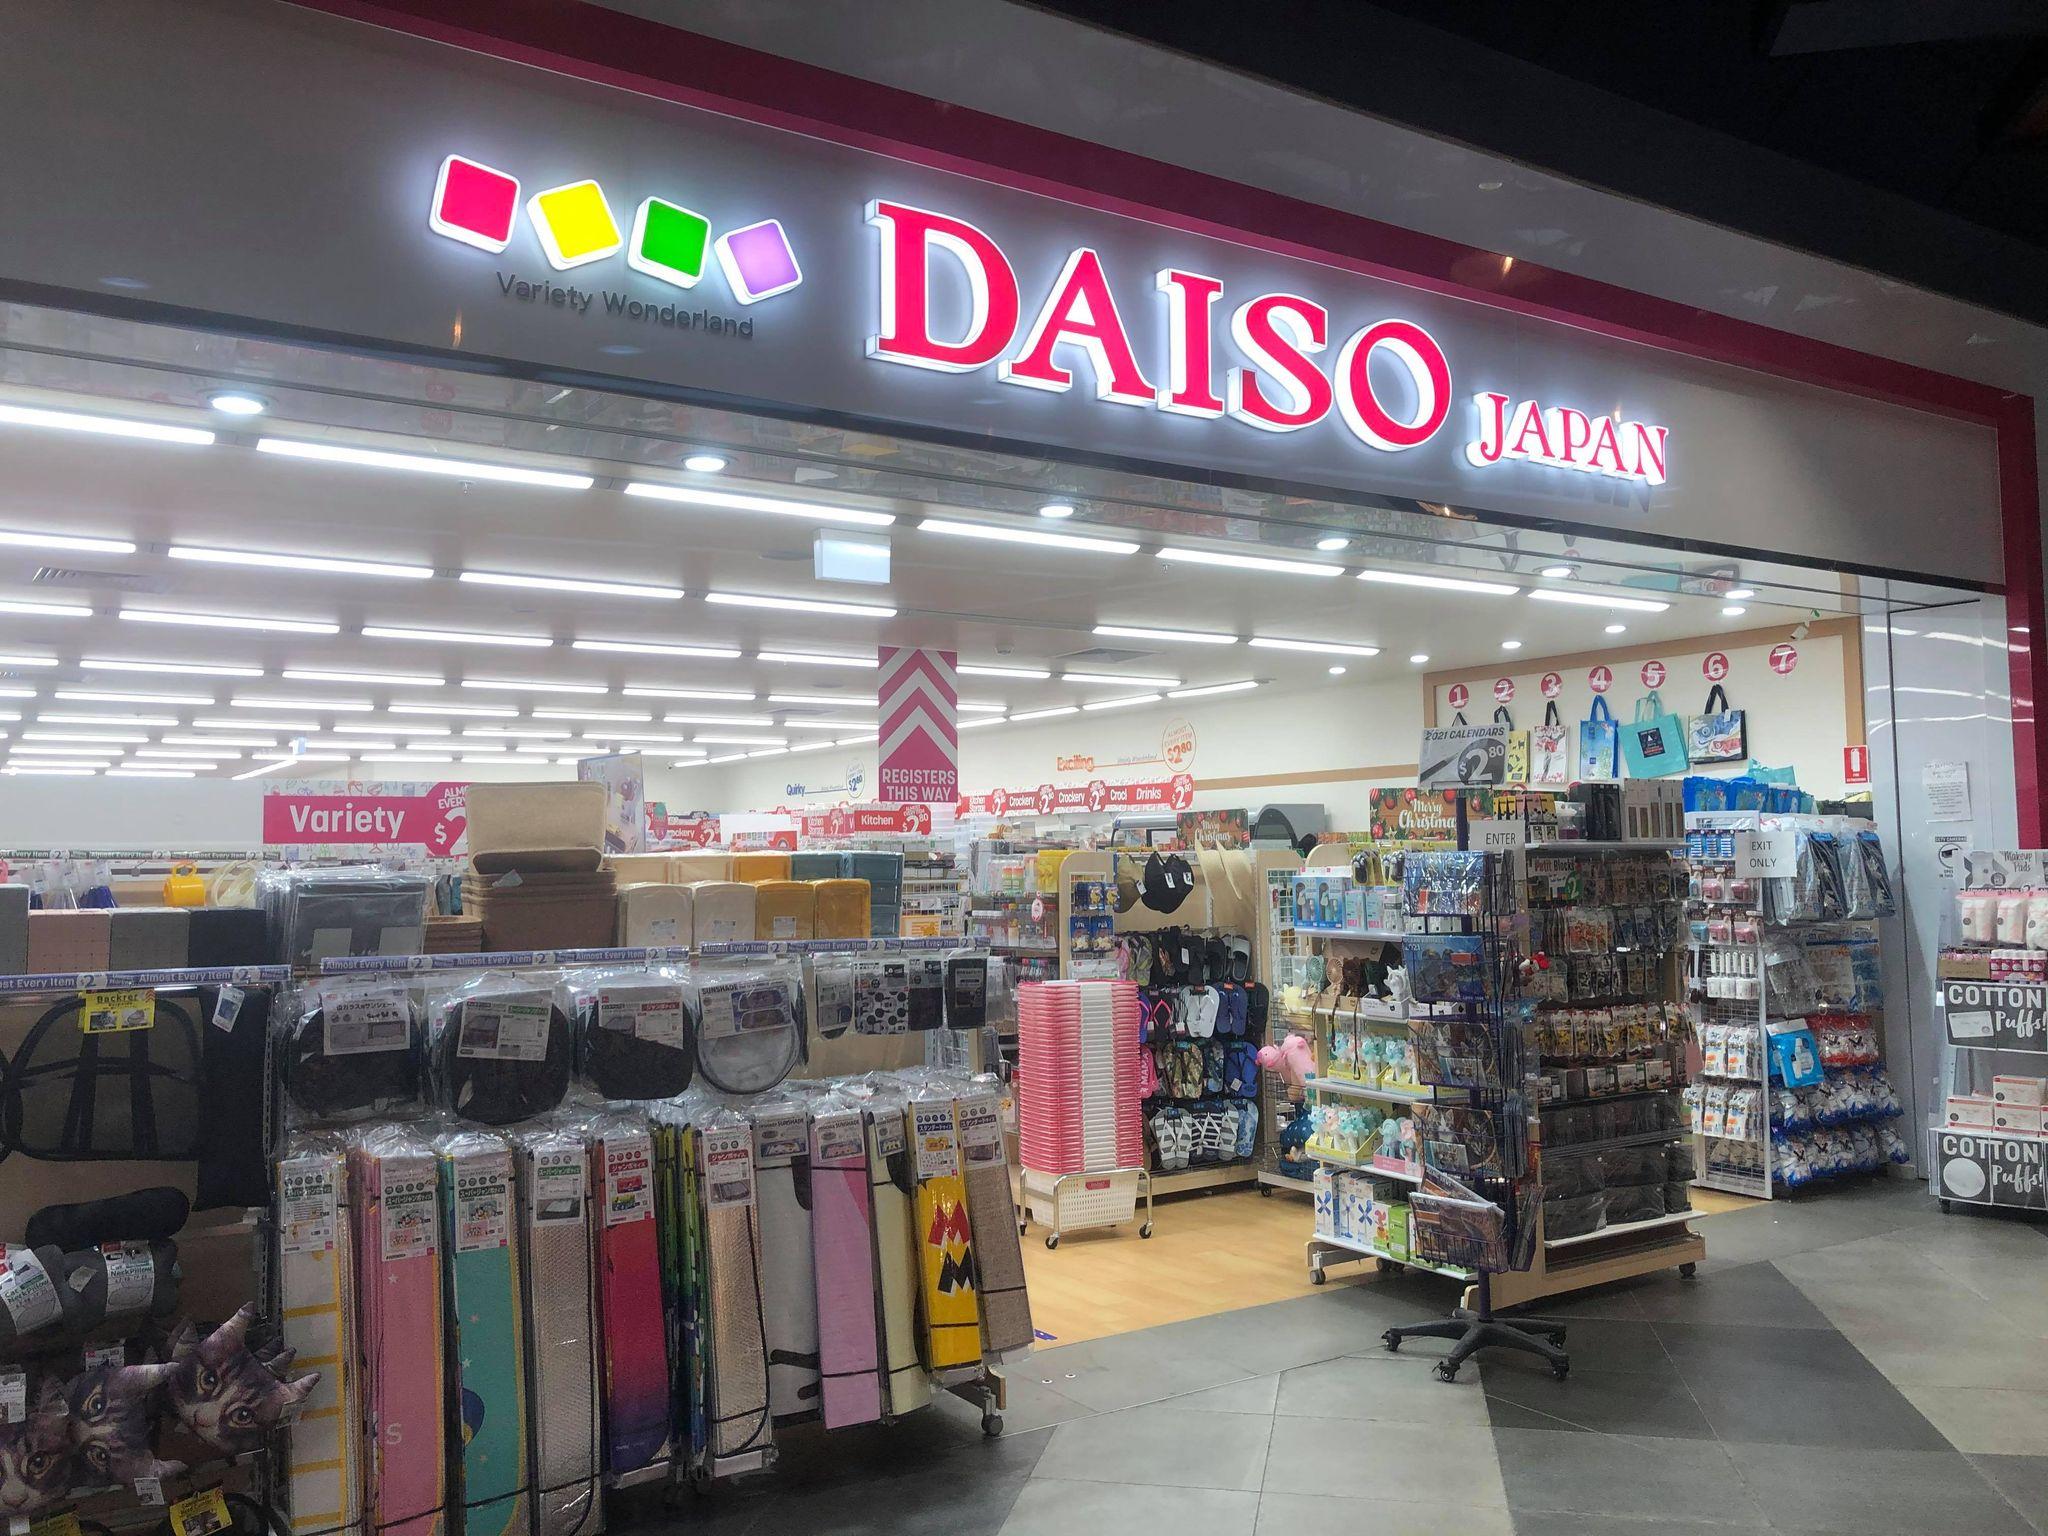 pacific werribee december 2020 daiso japan